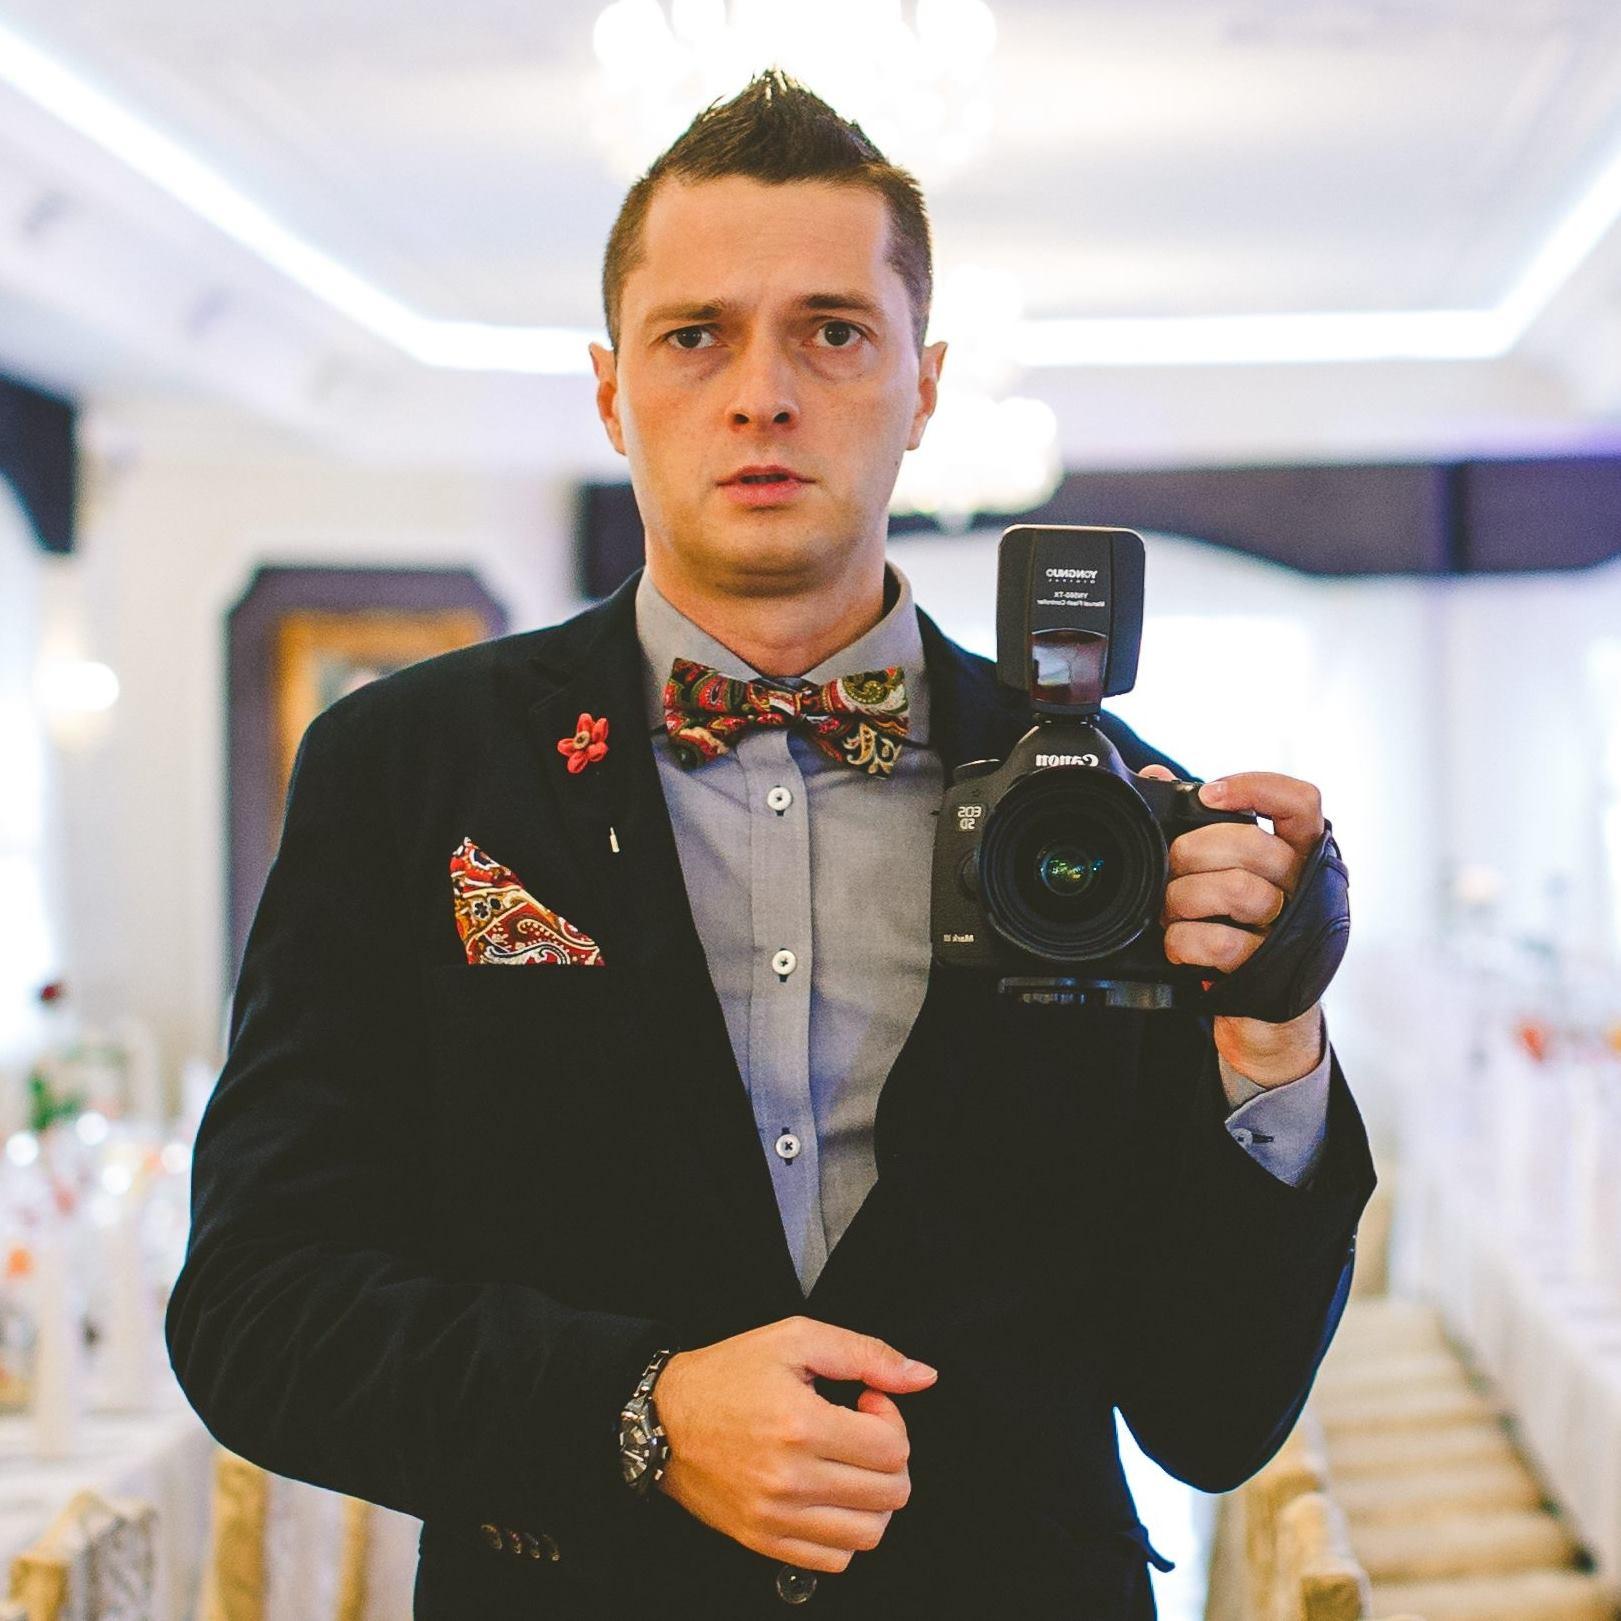 Kacper Białobłocki